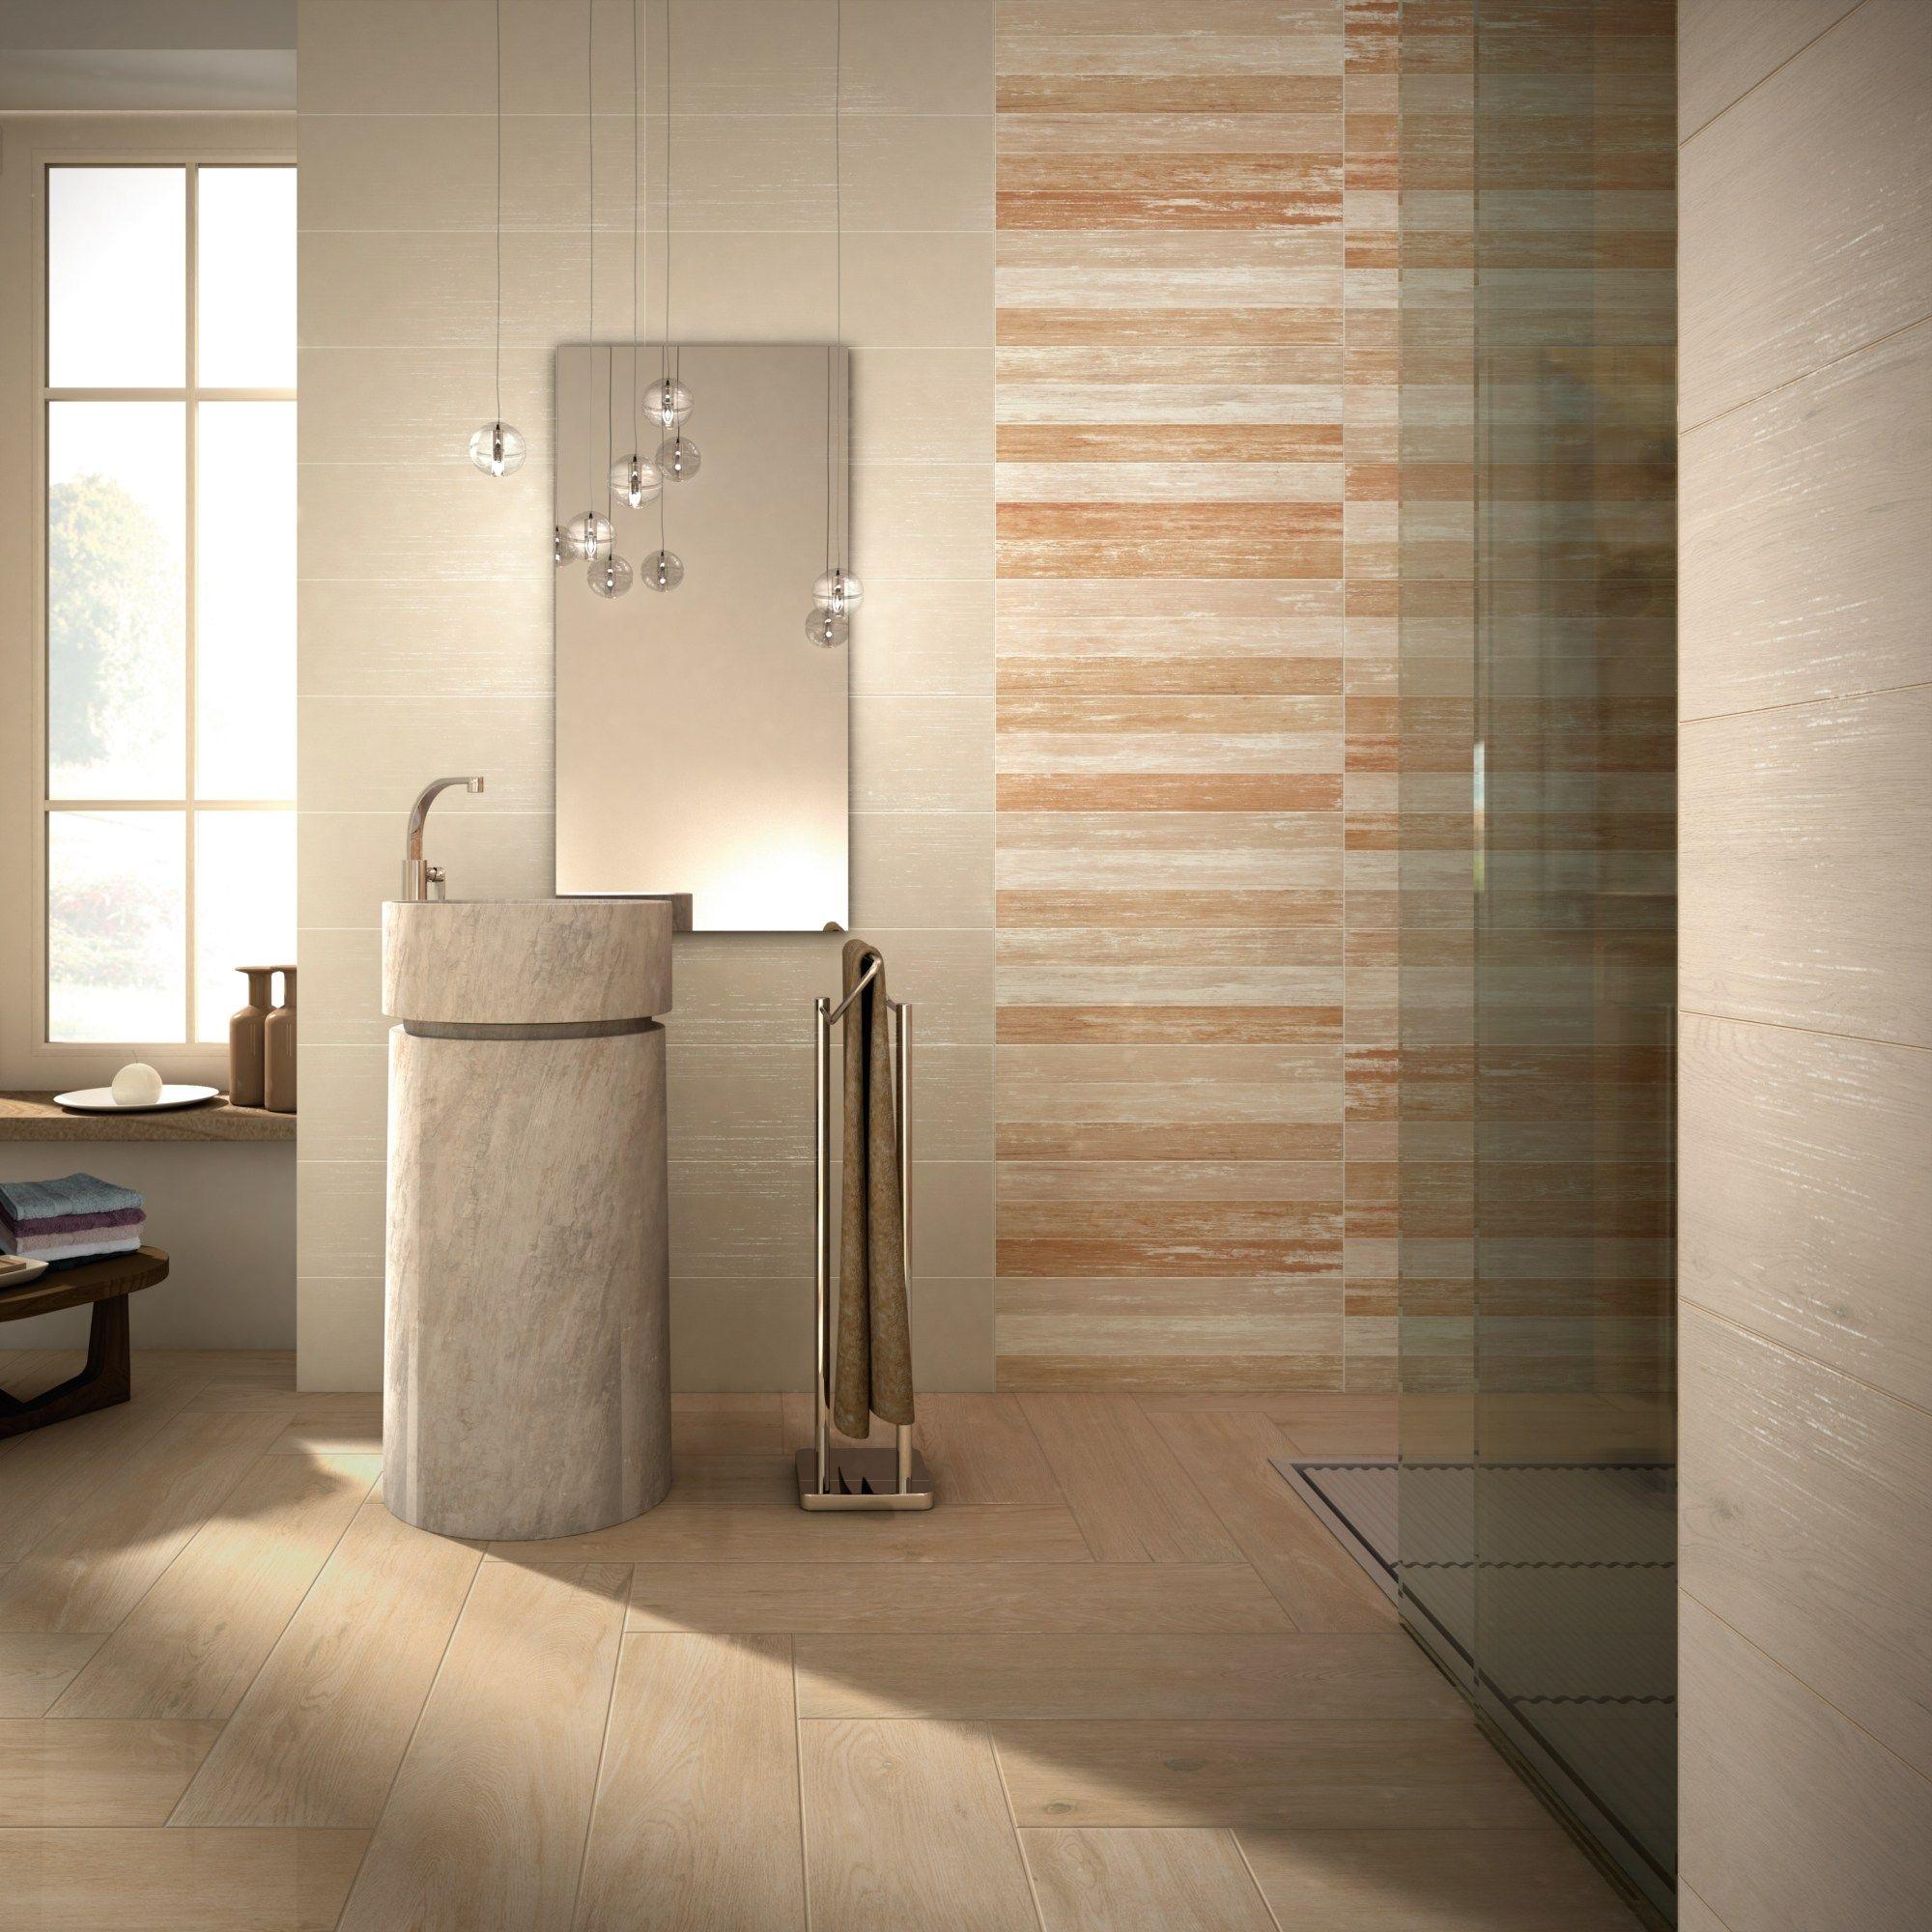 rev tement mural en c ramique p te blanche effet bois wood wall warm by flaviker contemporary. Black Bedroom Furniture Sets. Home Design Ideas